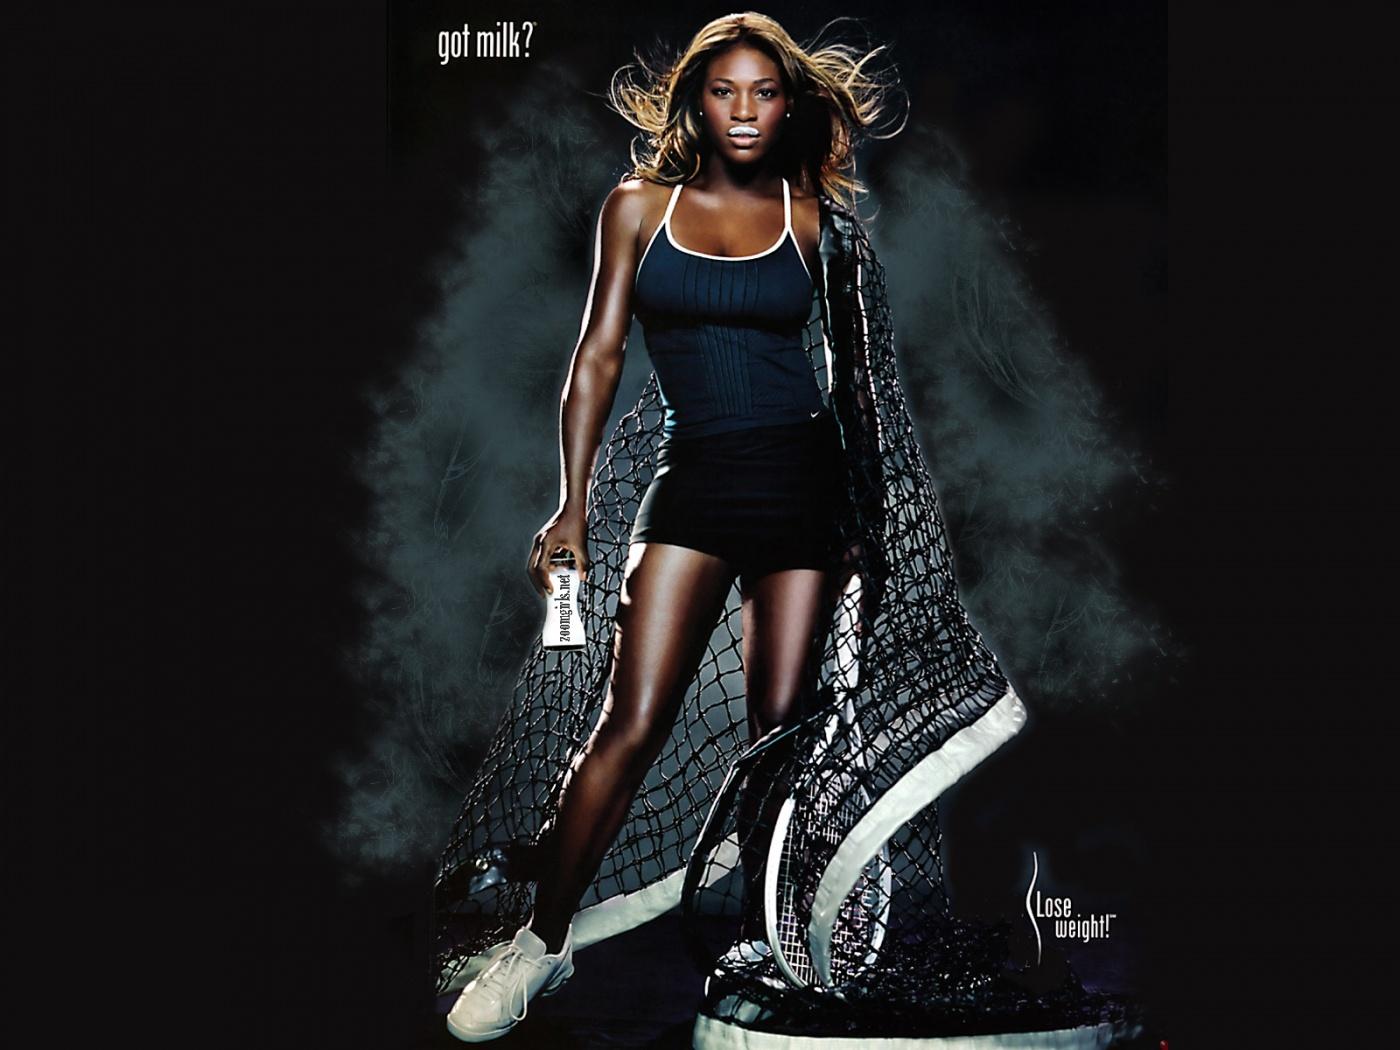 Tennis Super Stars Serena William Wallpapers 2013